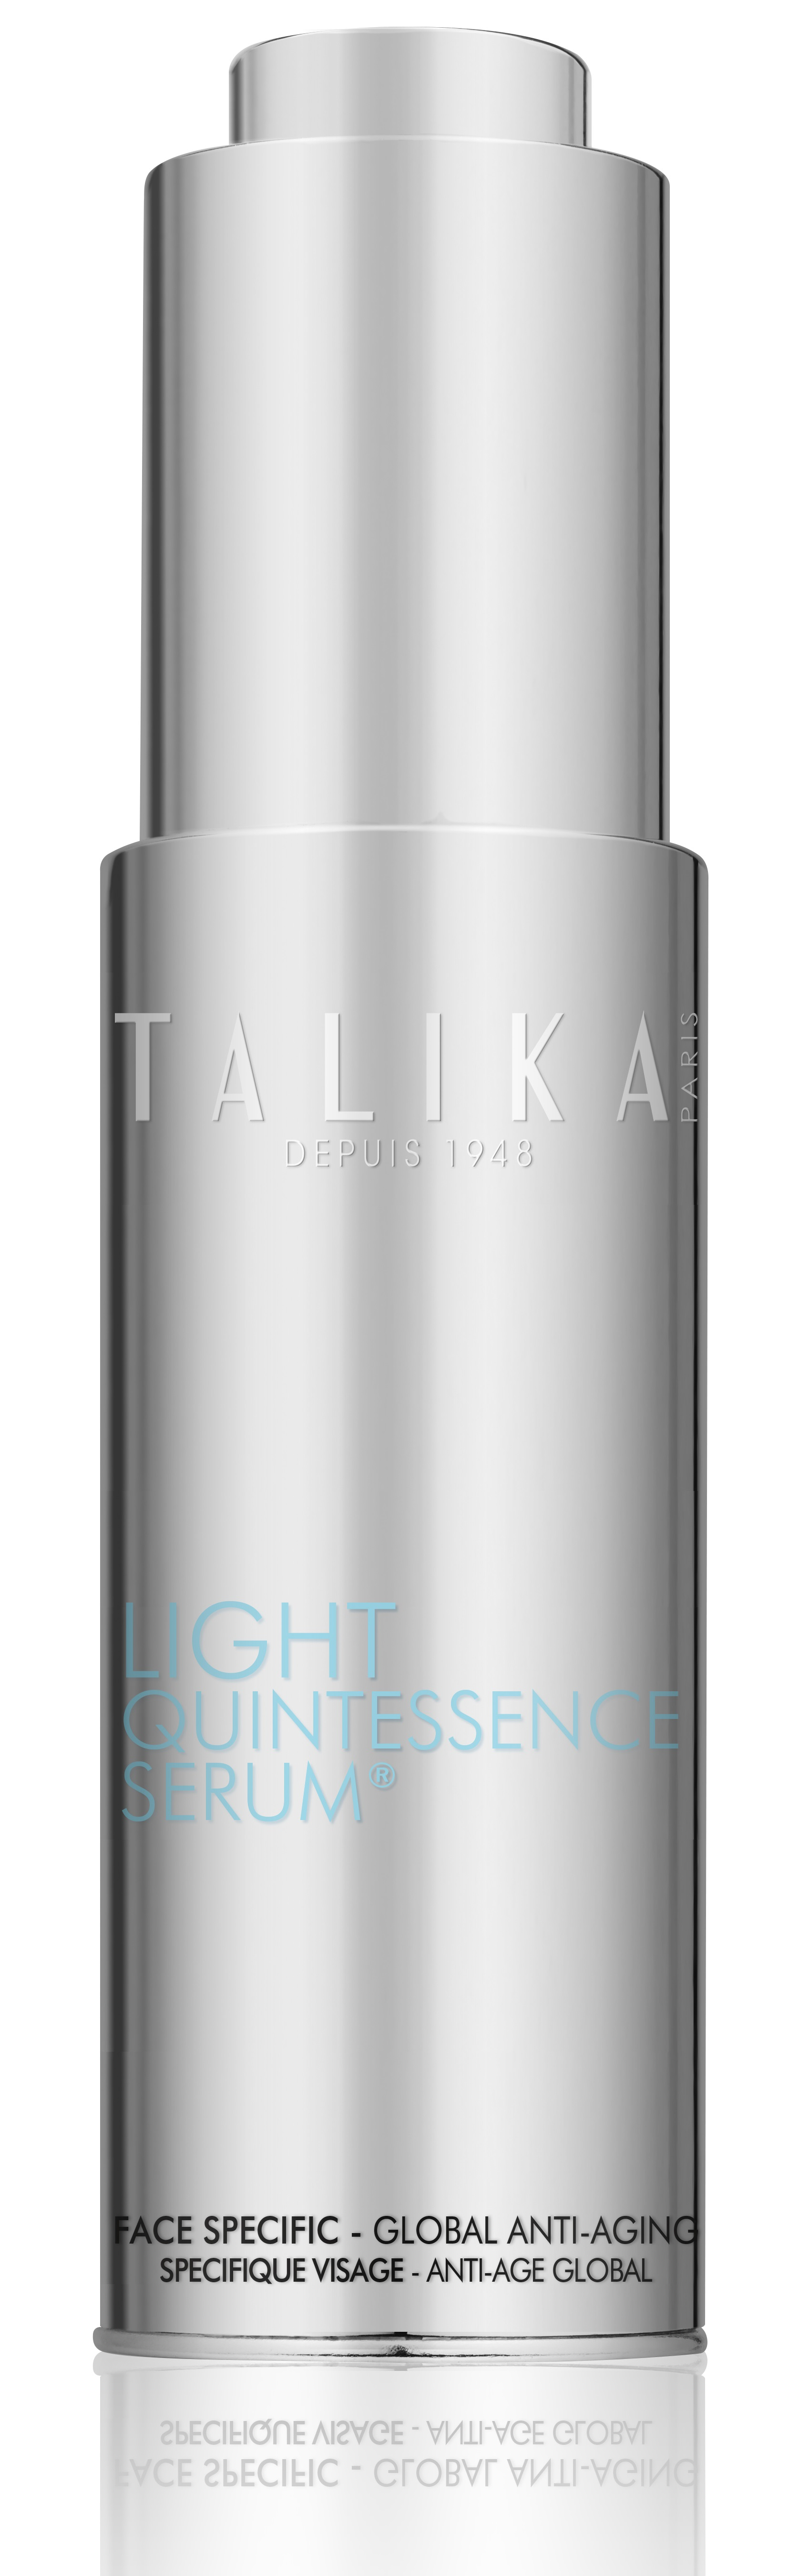 Talika_Light Quintessence Serum